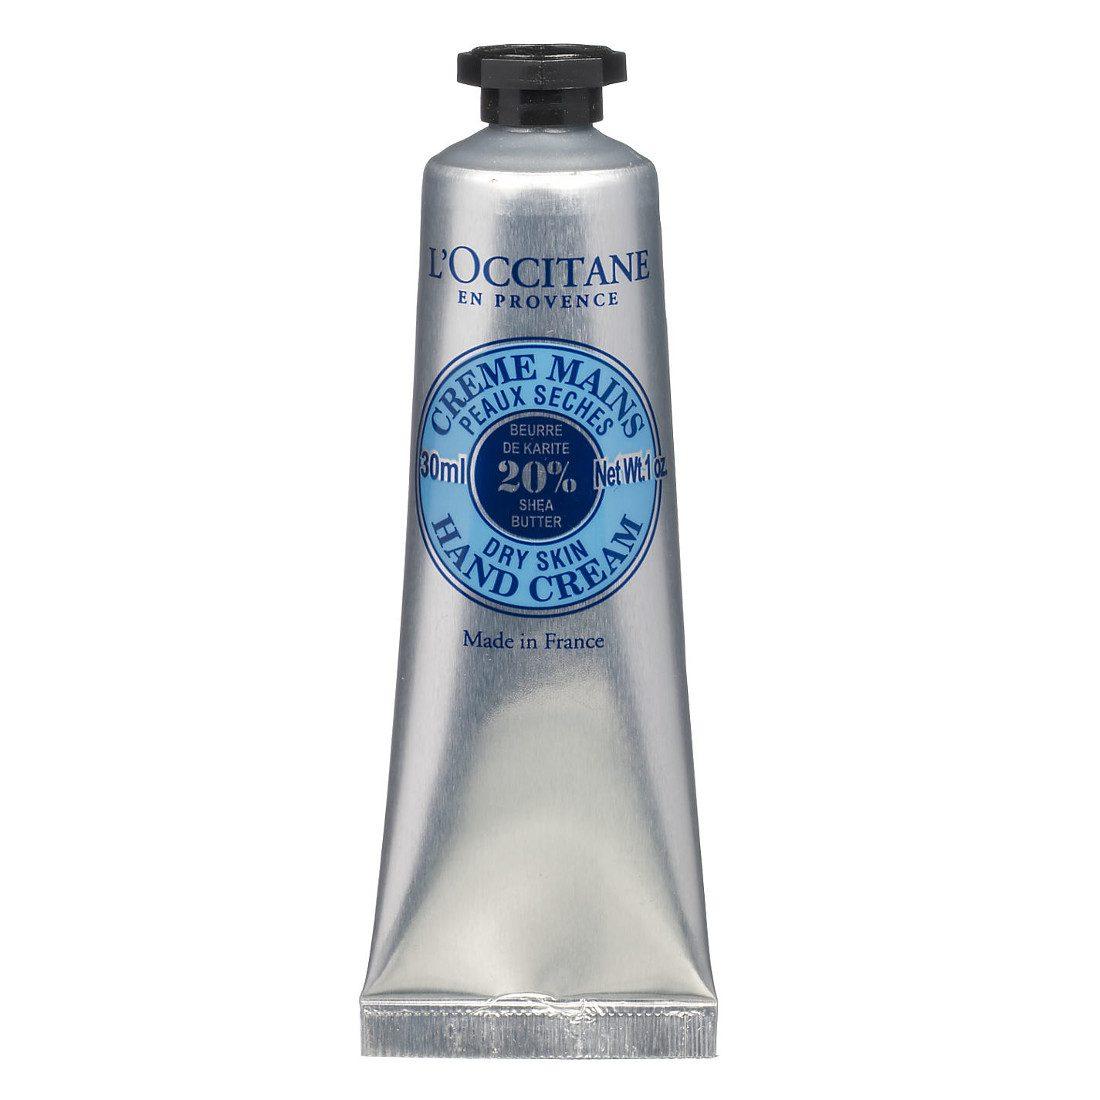 loccitane-en-provence-shea-butter-hand-cream-30-ml